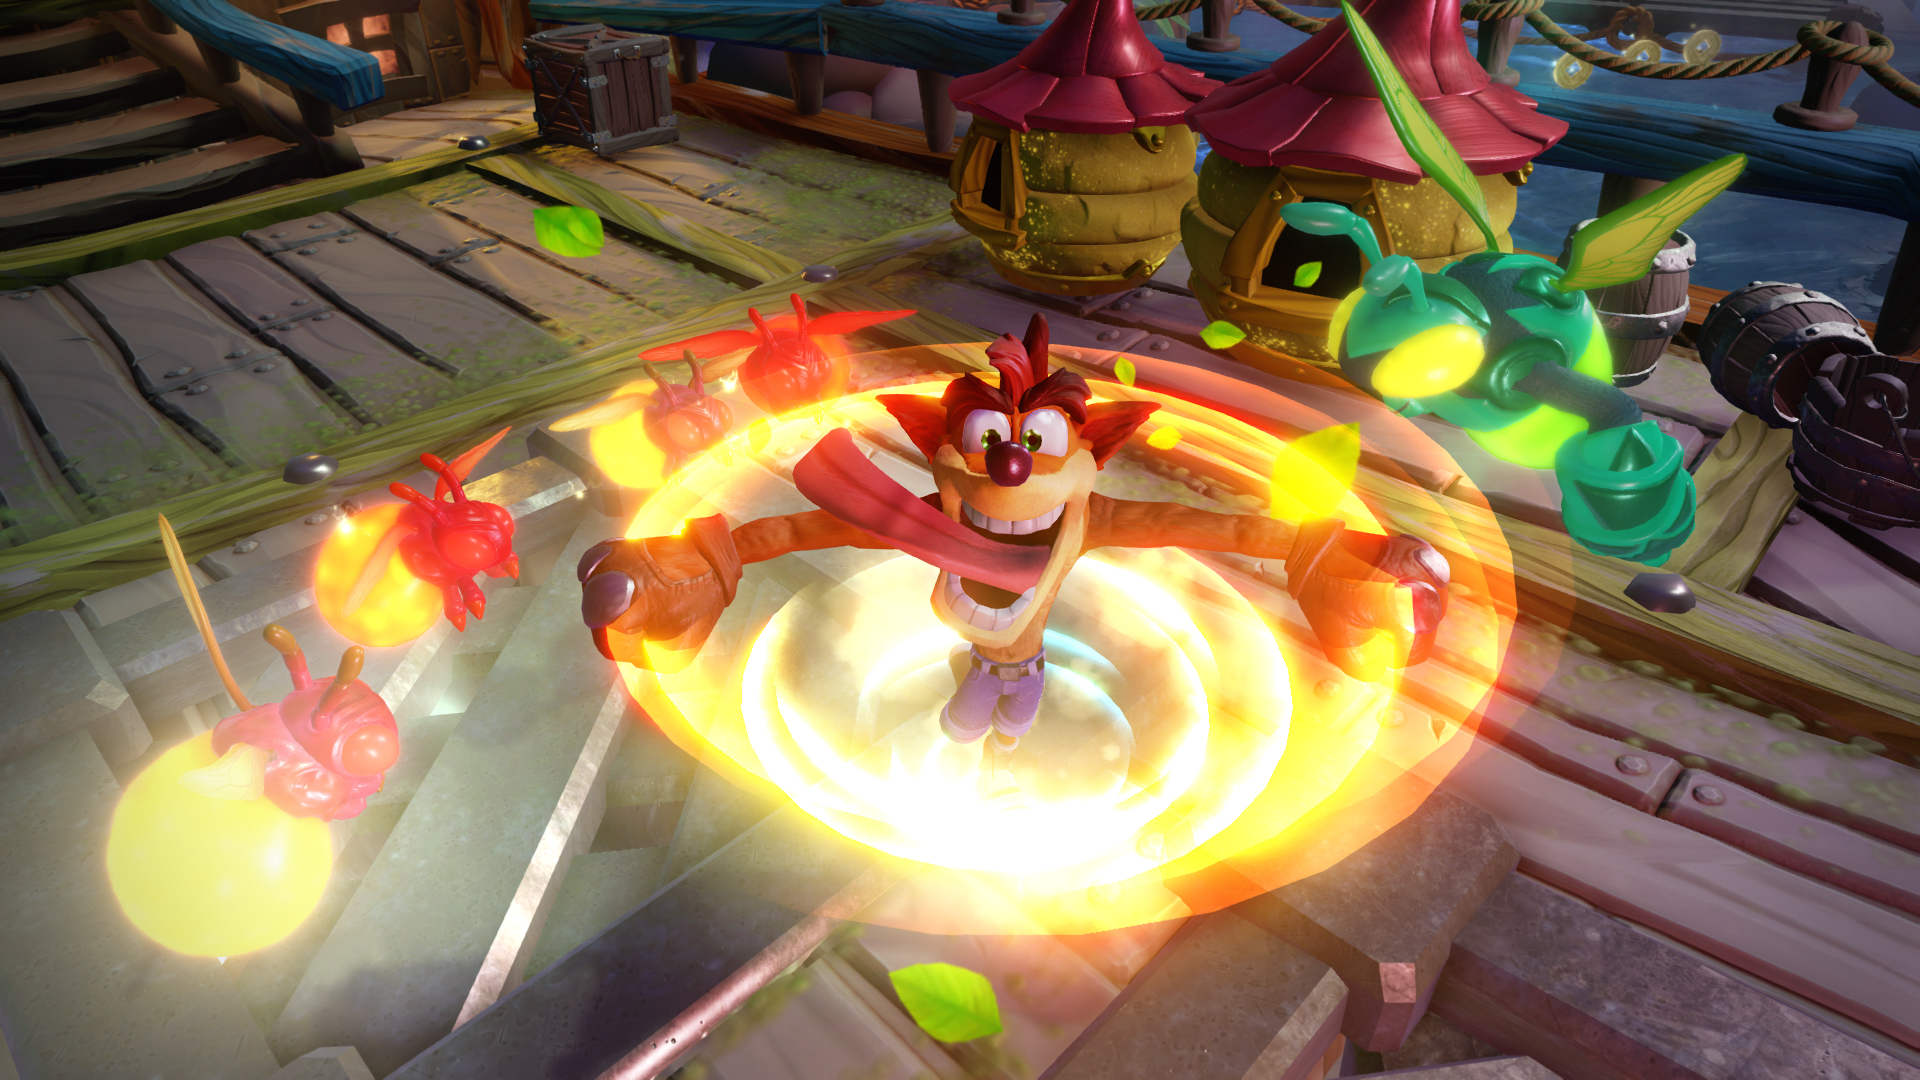 Crash Bandicoot is playable in the upcoming Skylanders Imaginators.